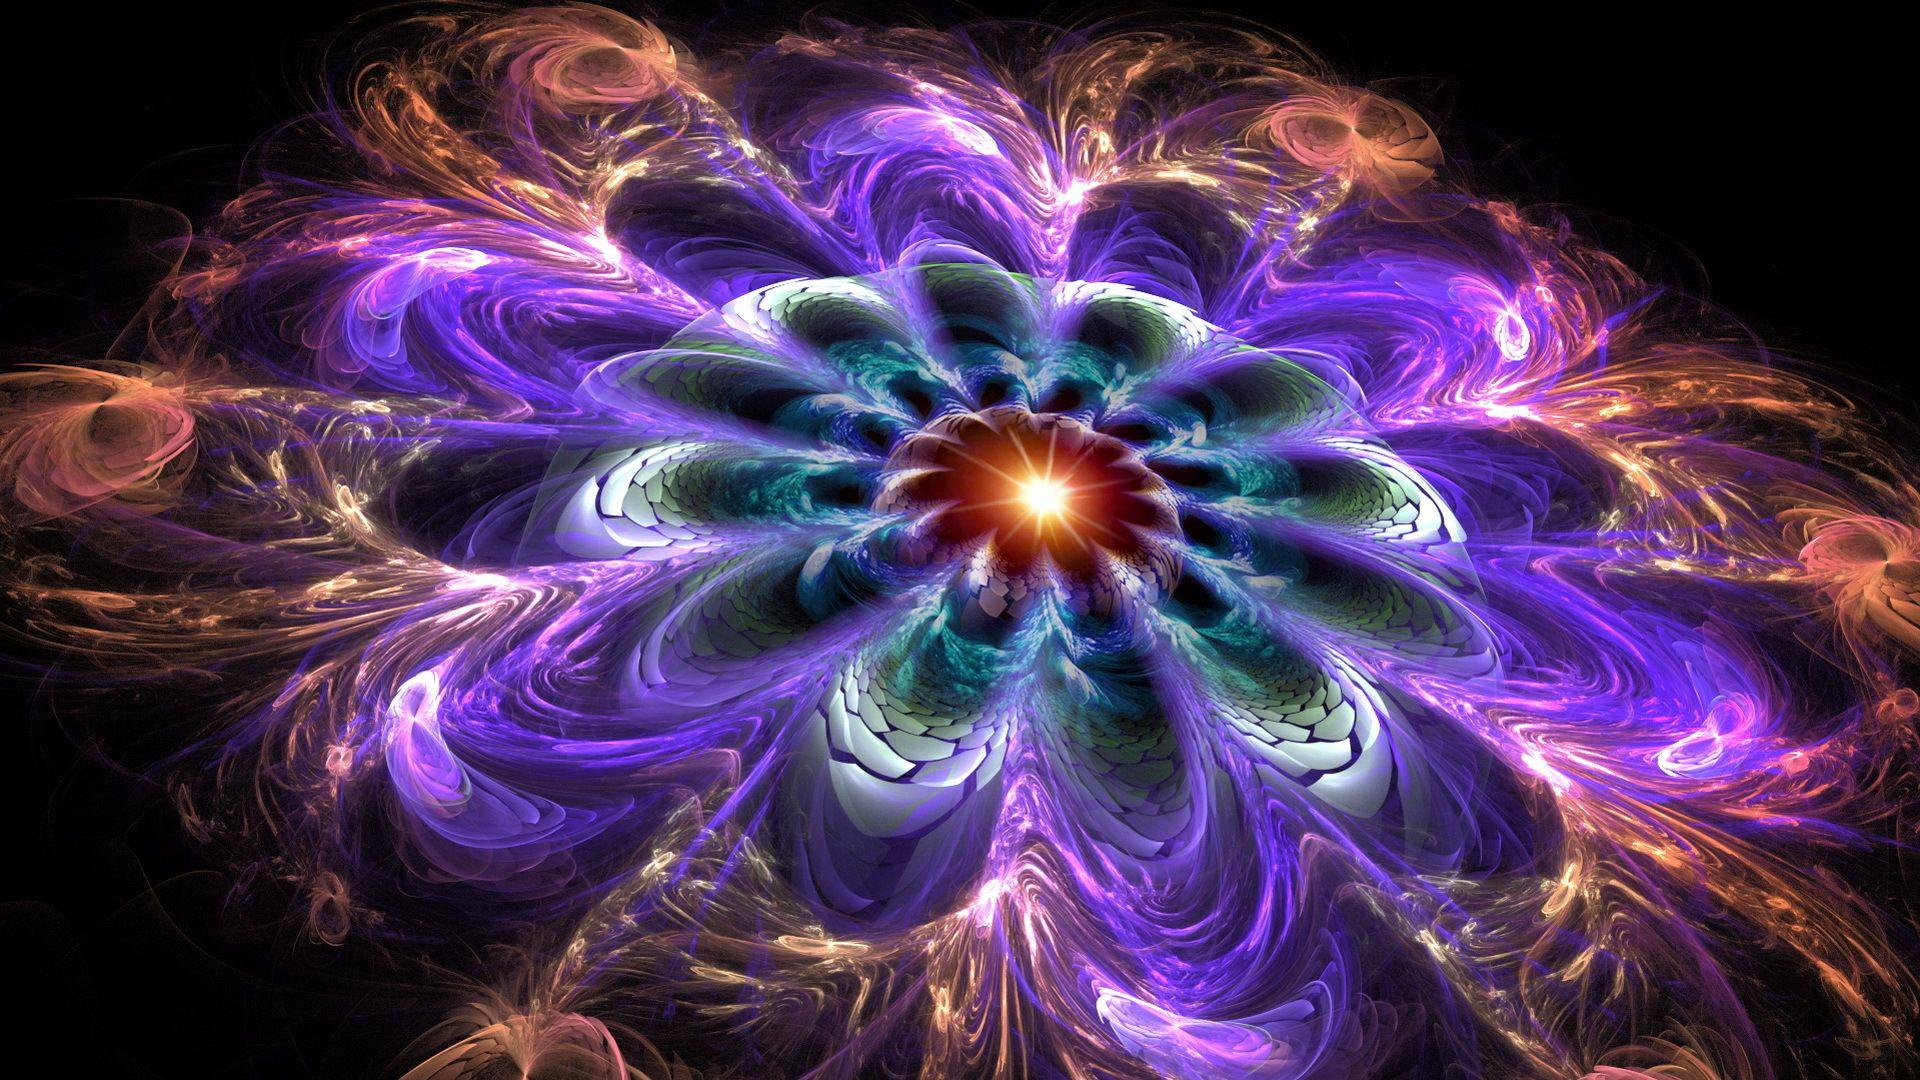 Fractal Flower desktop wallpaper